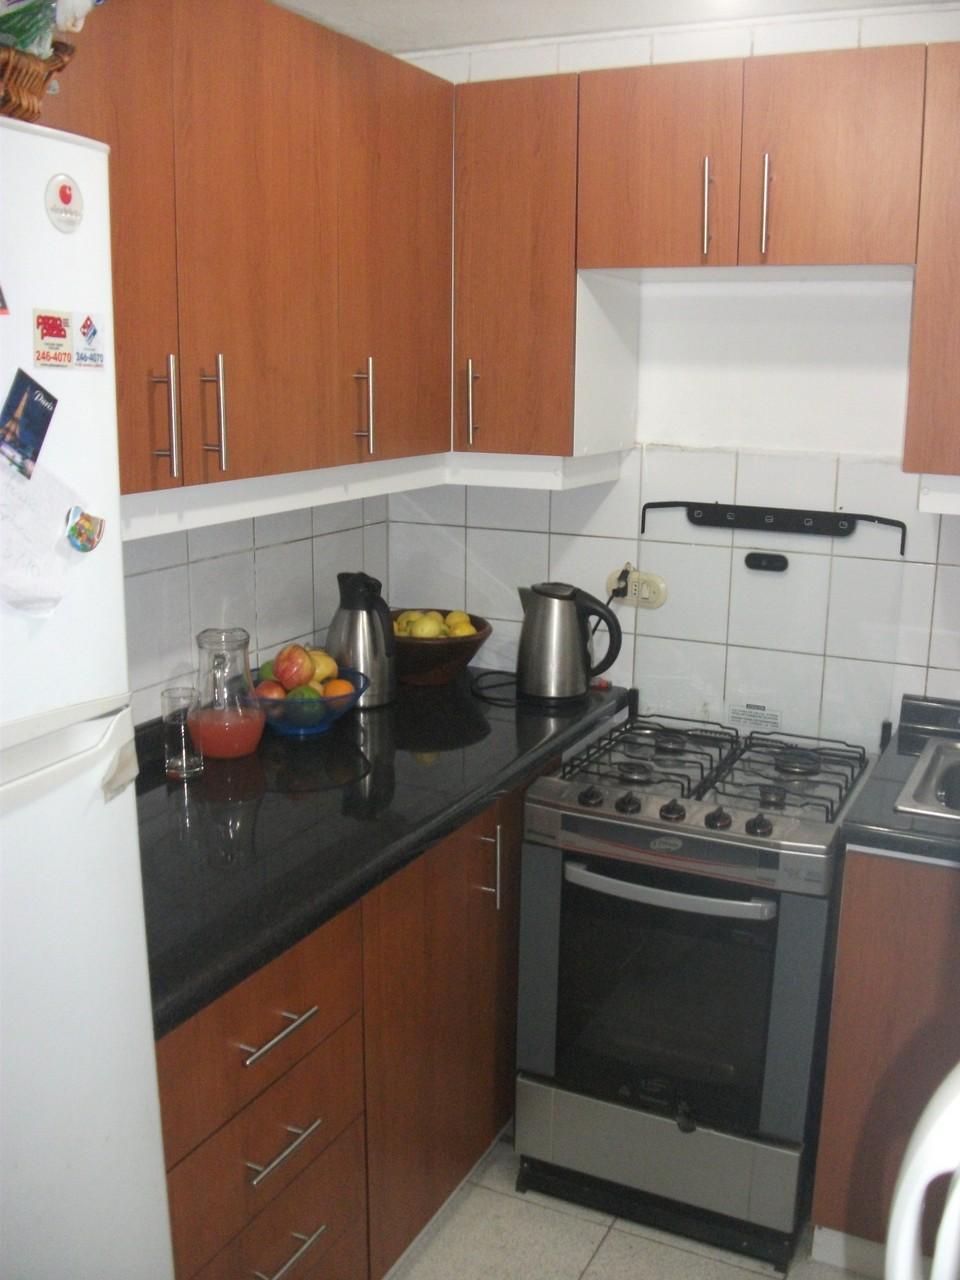 Cocina moderna isabel mr muebles modulares para locales for Muebles modulares cocina